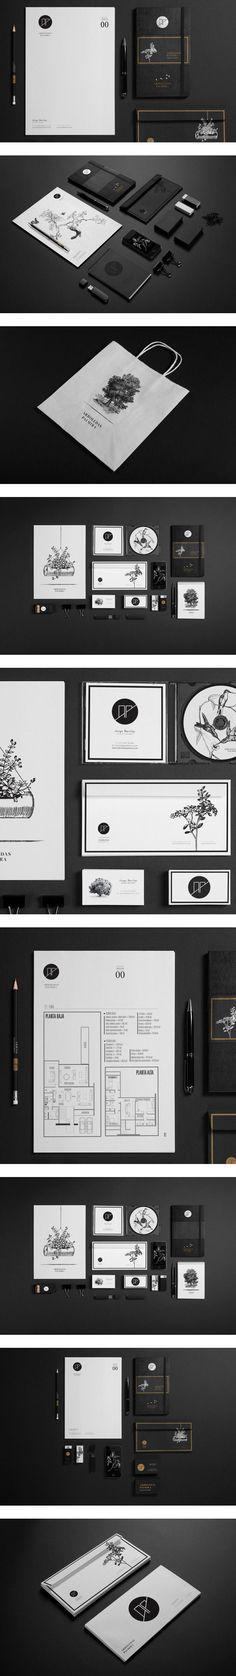 Arboledas Palmira by Diego Leyva, via Behance sustainable community #identity #packaging #branding PD: